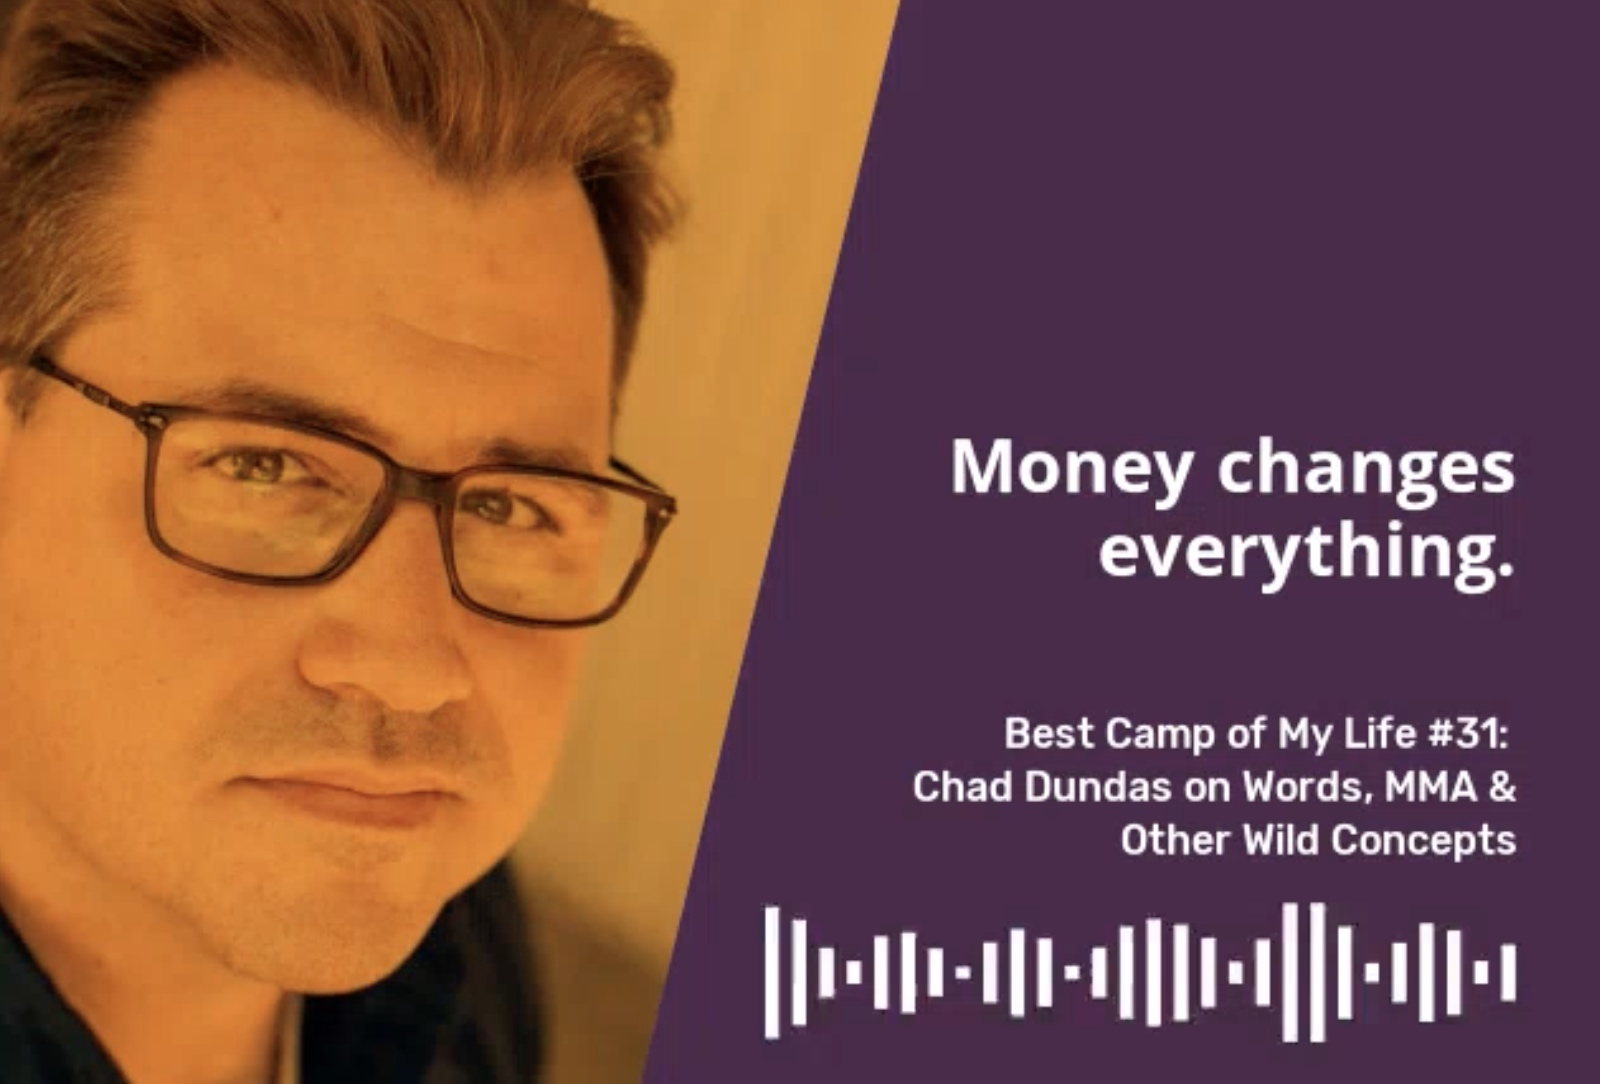 chad dundas best camp